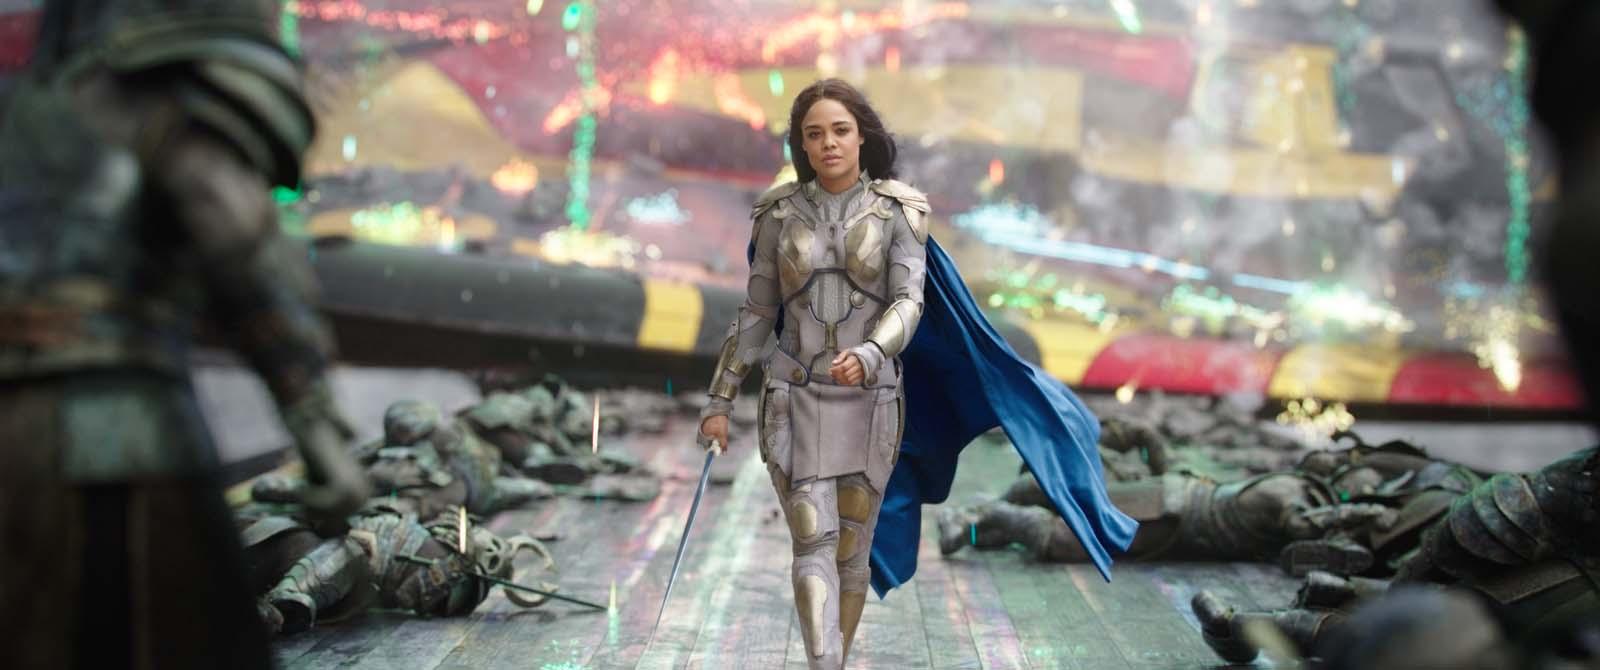 Thor - Ragnarok - 2017